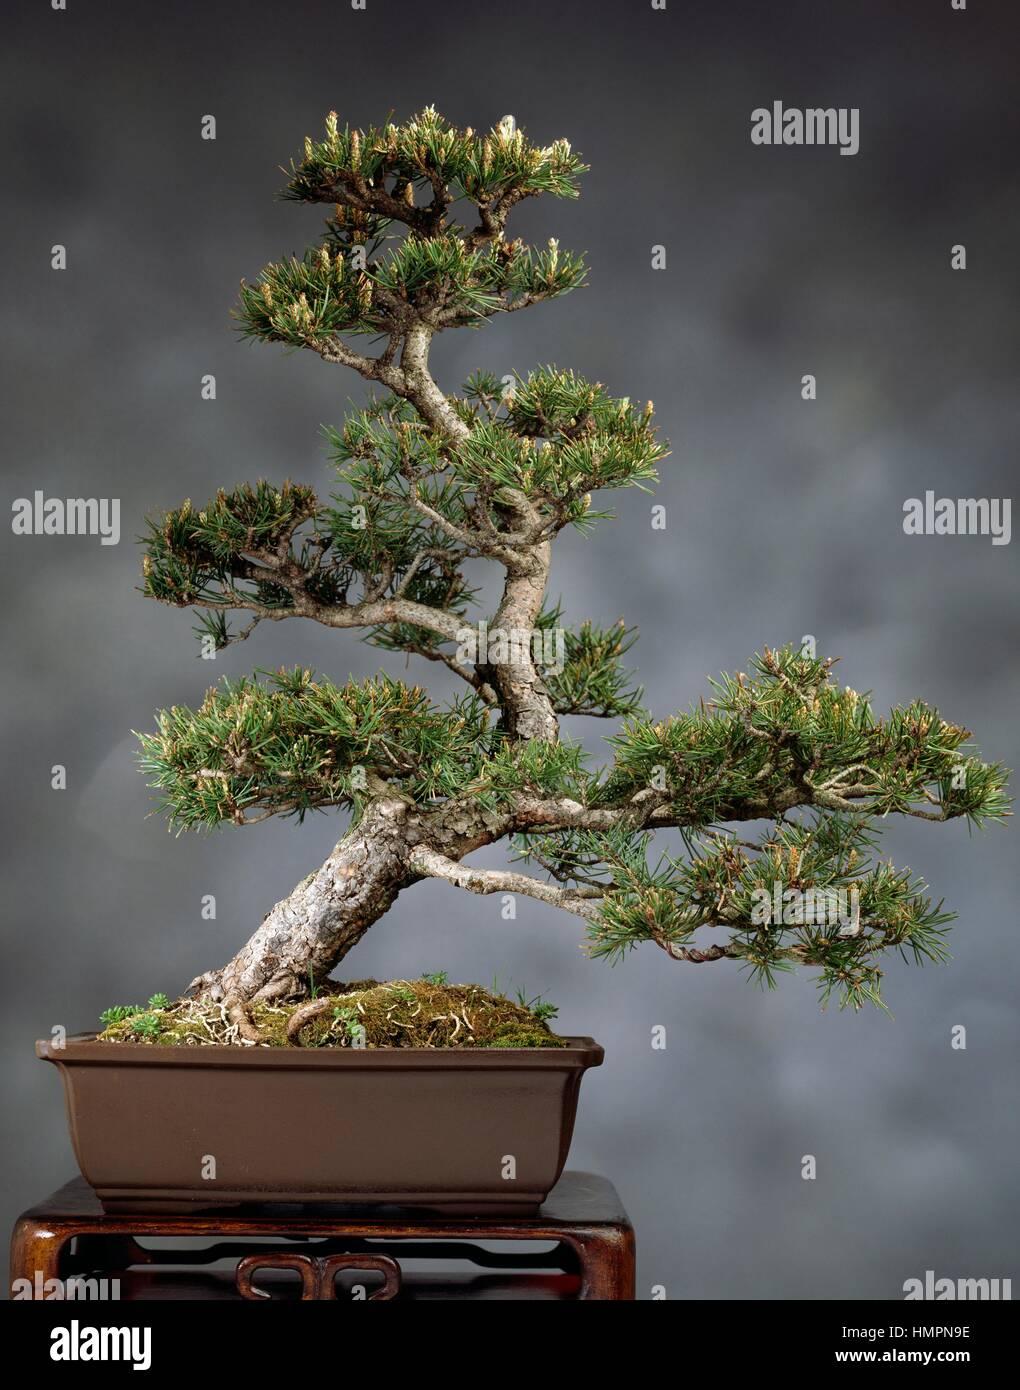 scots pine pinus sylvestris bonsai stockfotos scots pine. Black Bedroom Furniture Sets. Home Design Ideas